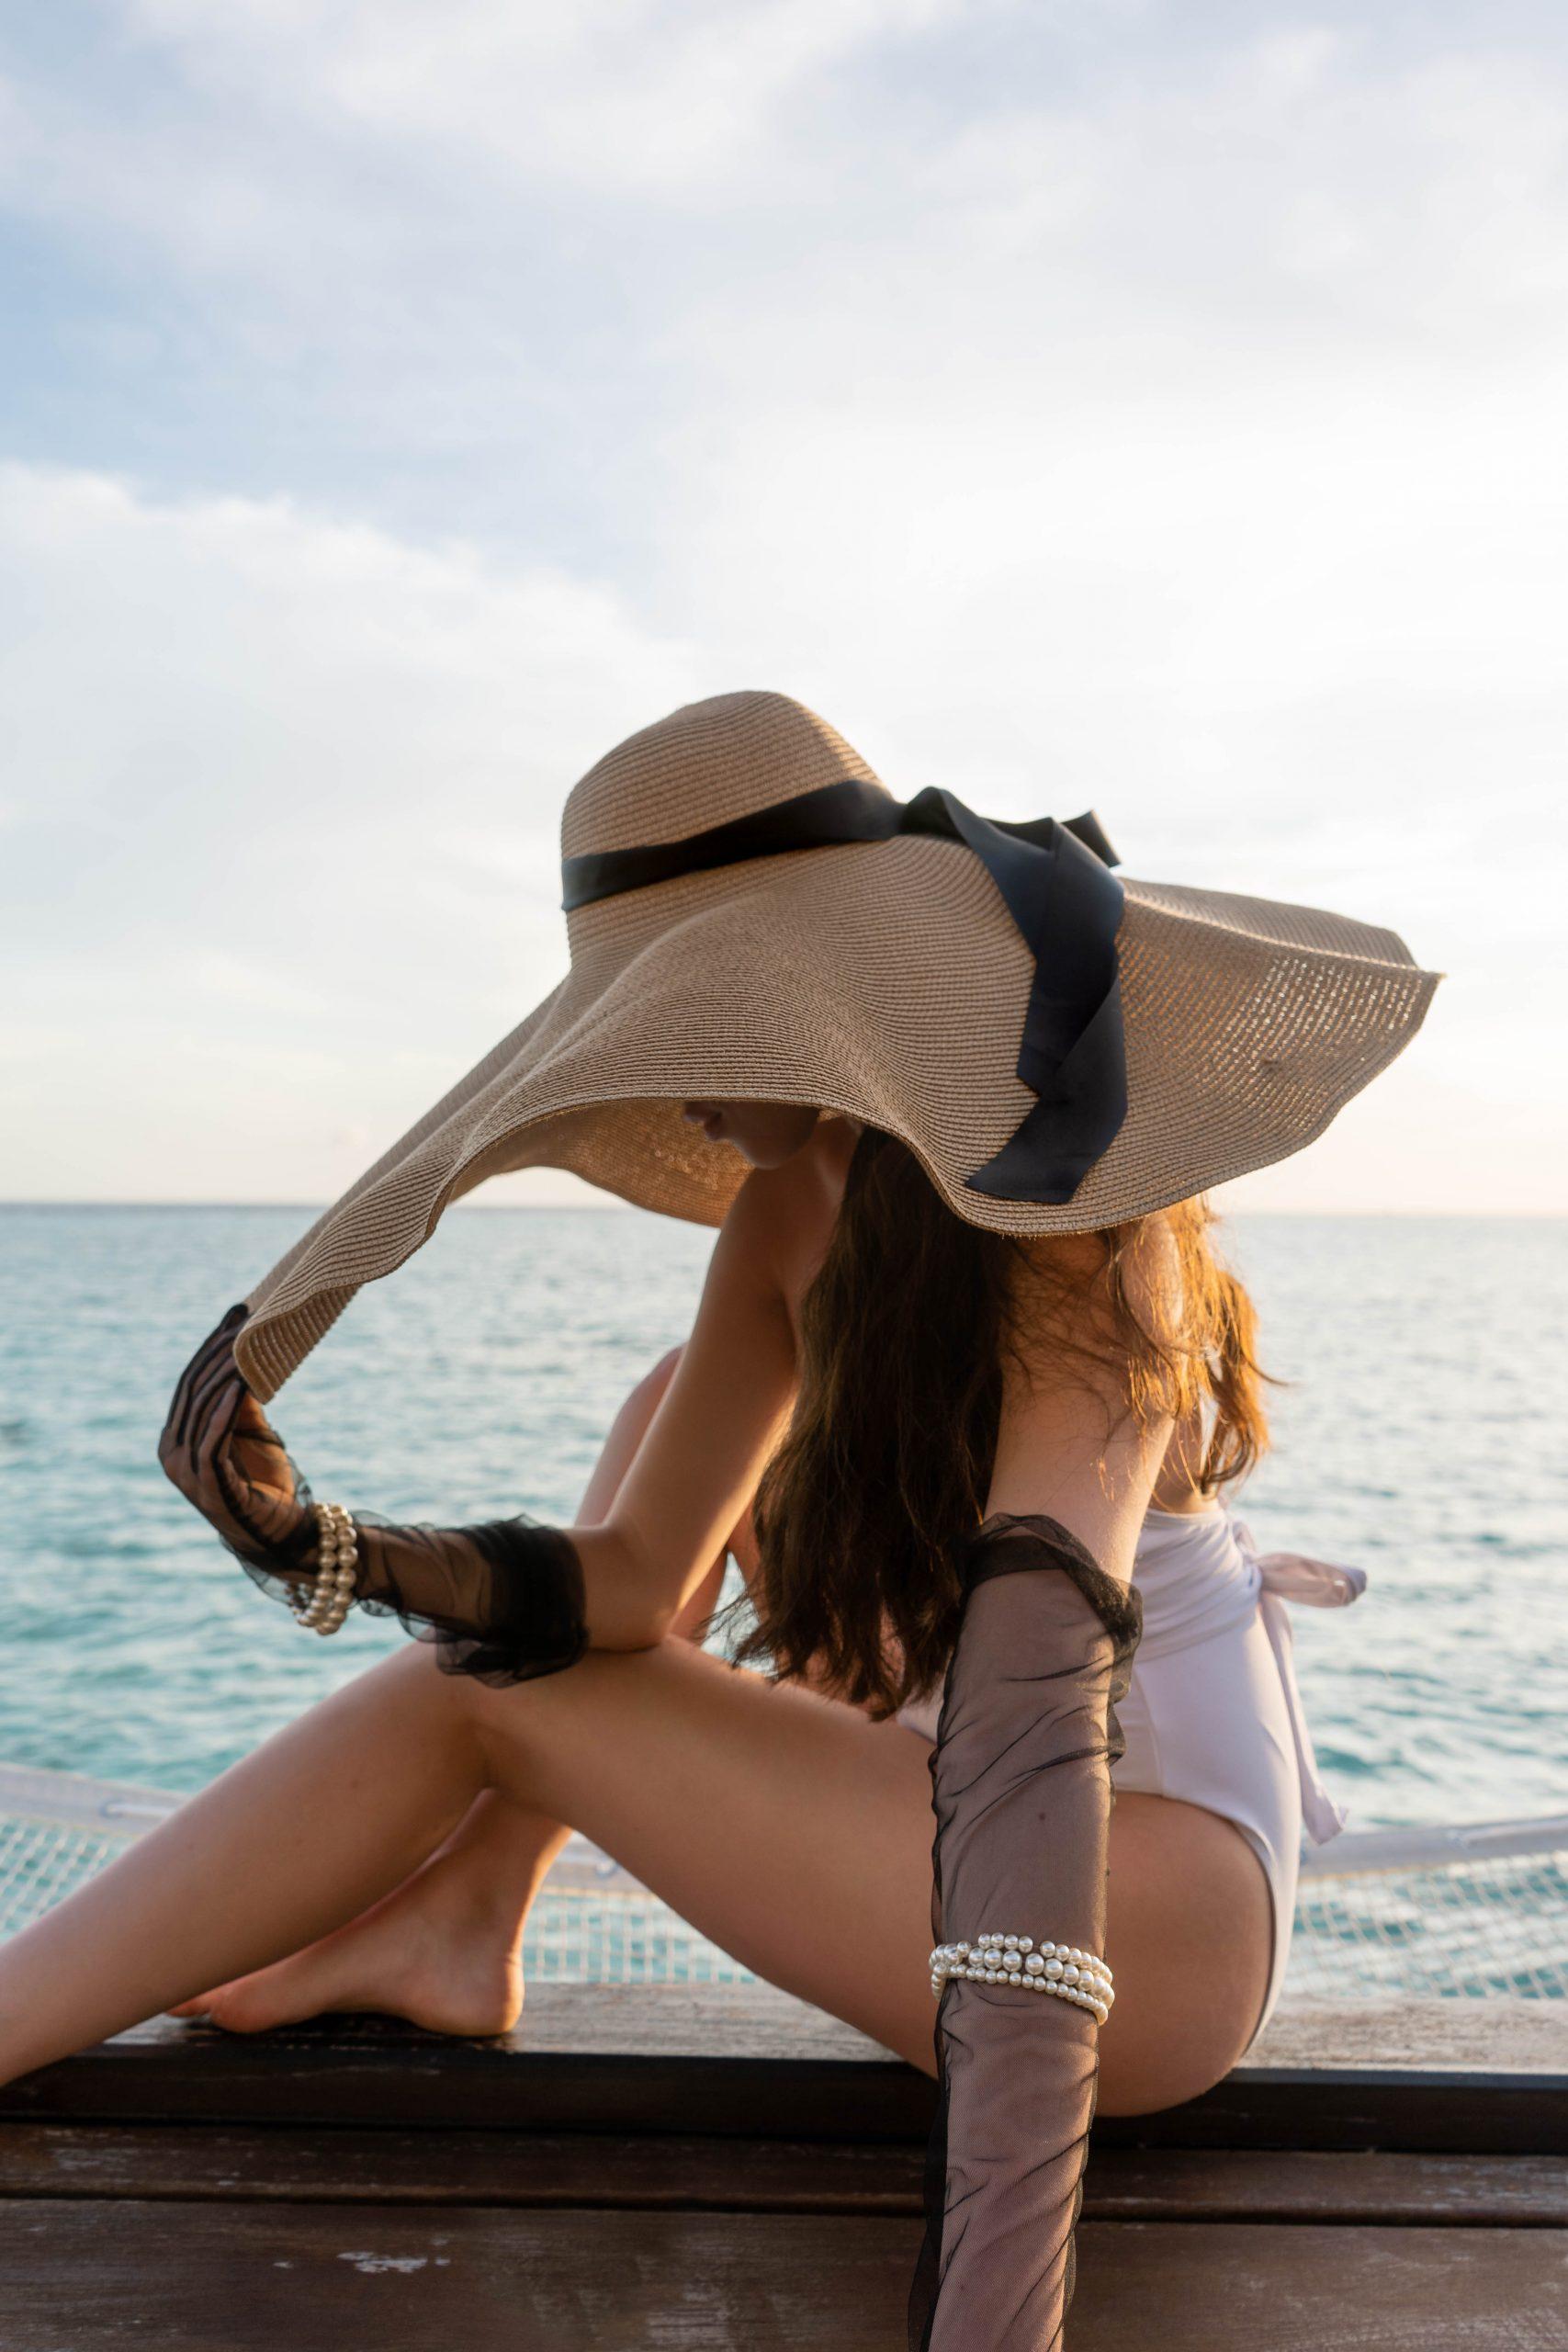 oversized straw sun hat floppy black ribbon inexpensive white one piece swimsuit black tulle mesh glove pearl bracelet maldives indian ocean eva phan